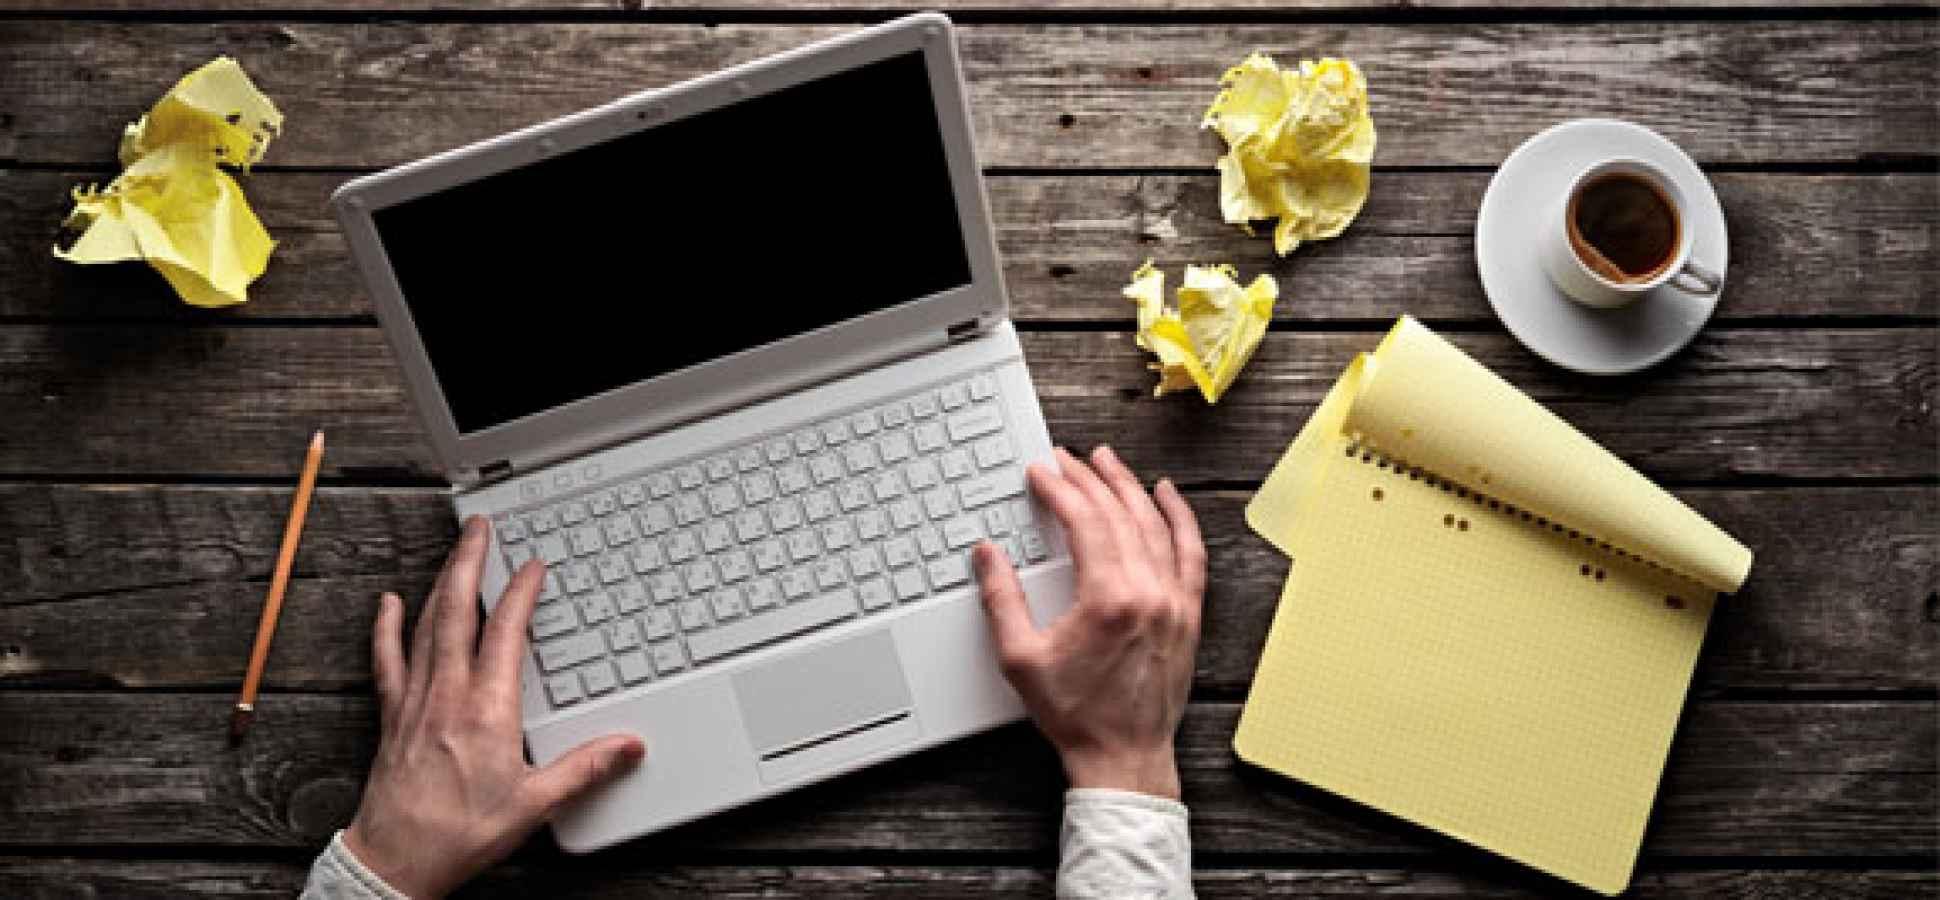 9 Ways to Create an Amazing Blog